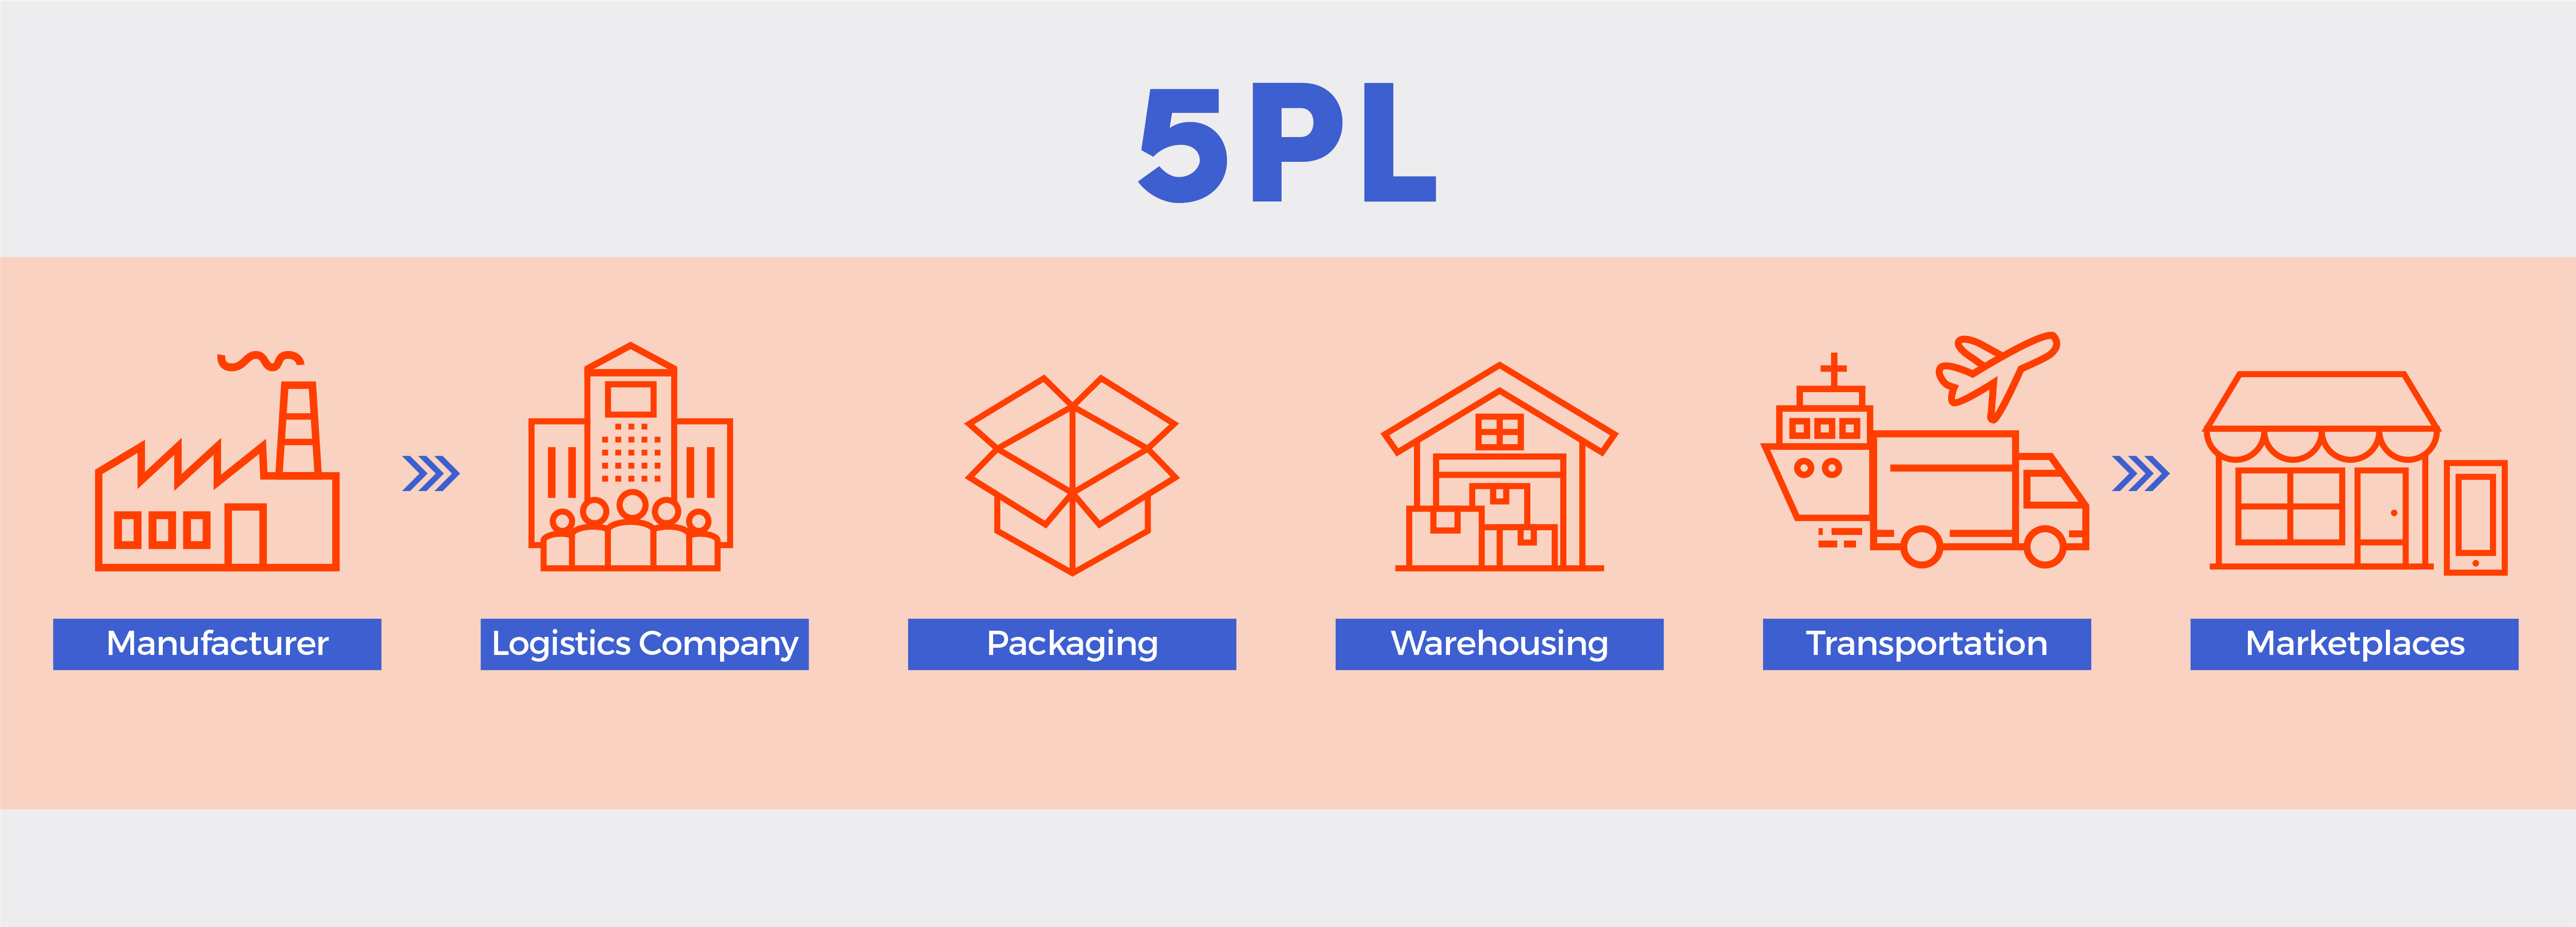 A 5PL Supply Chain Flowchart